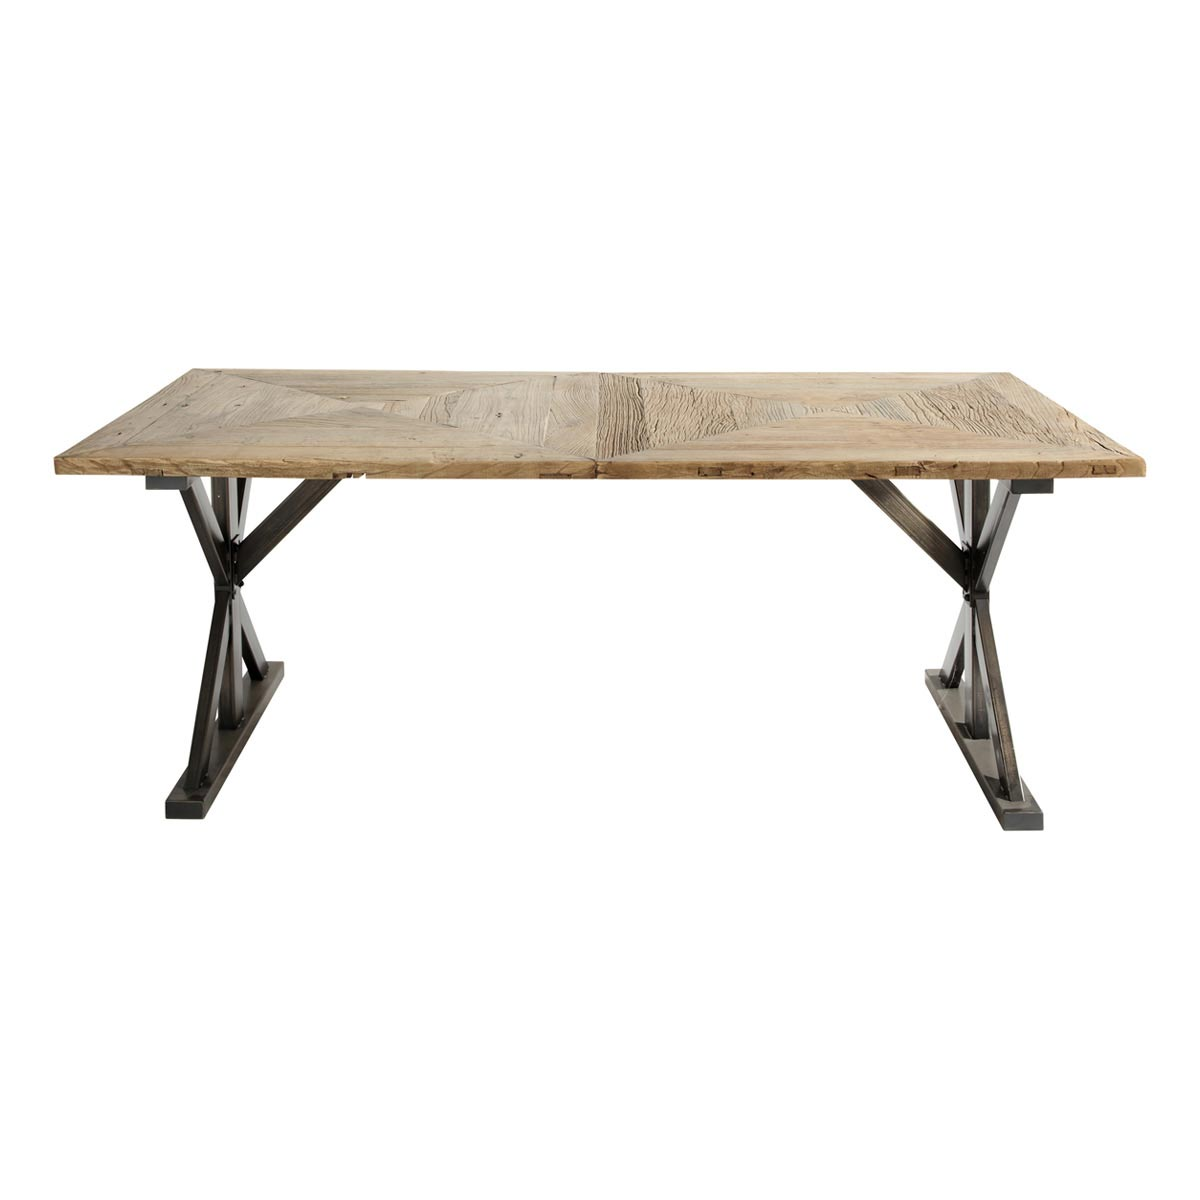 cheap maisons du monde foto mesa de comedor rectangular de madera reciclada lige with table maison du monde